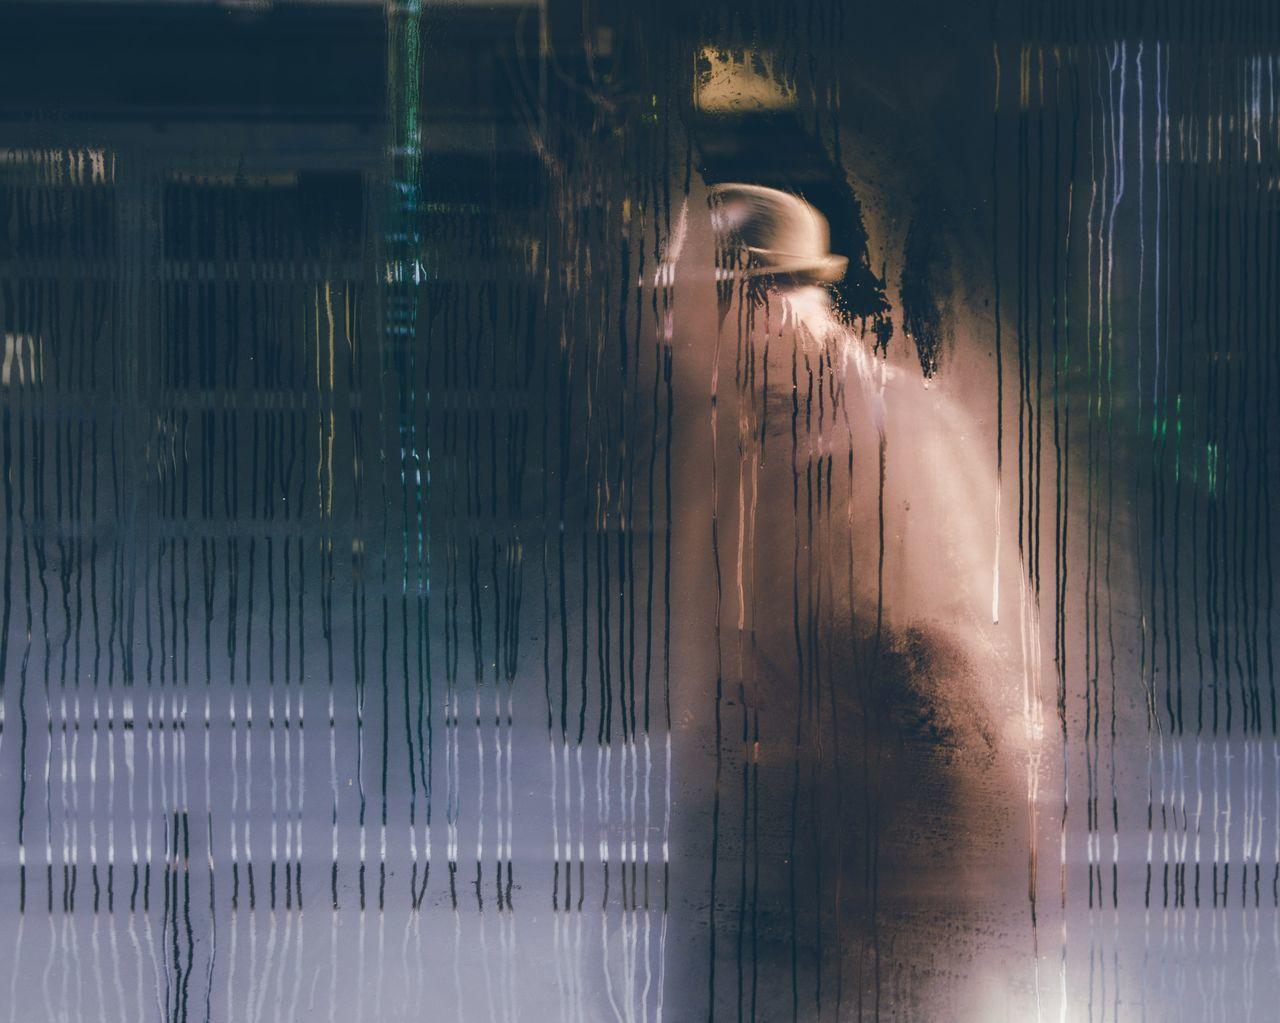 Person seen through wet window